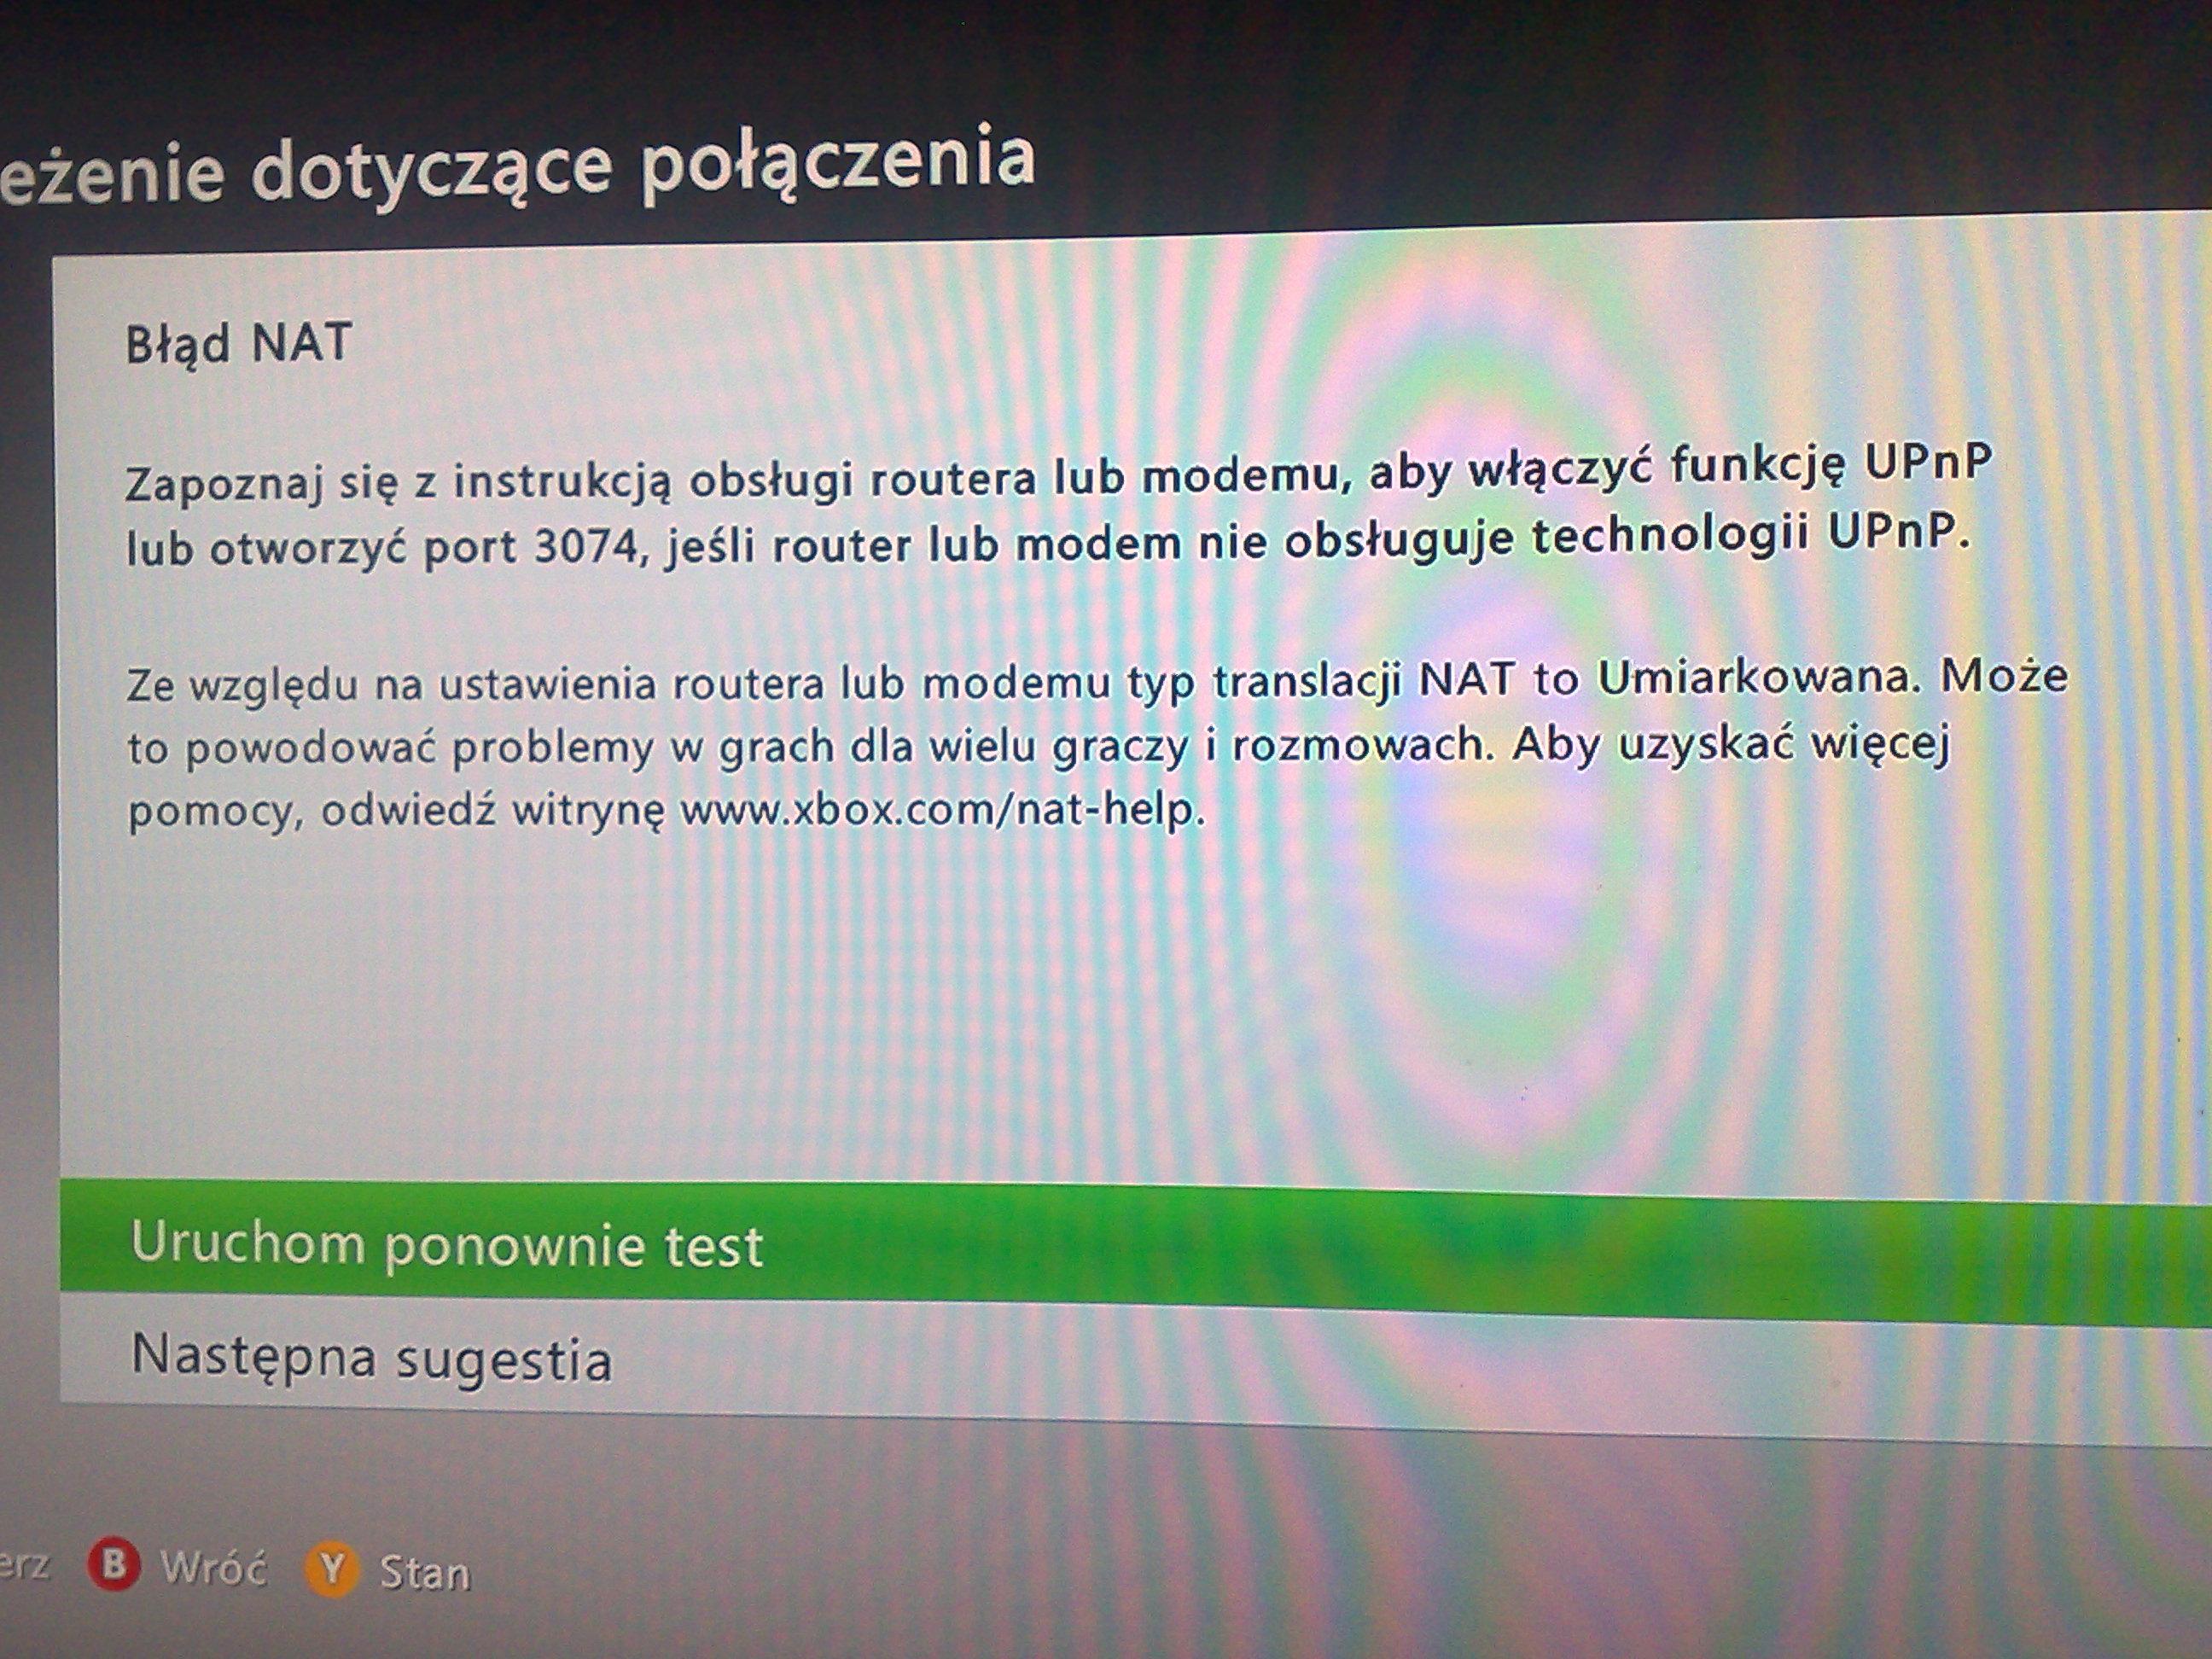 PROBLEM - NETIA SPOT - UPNP, PORT 3074